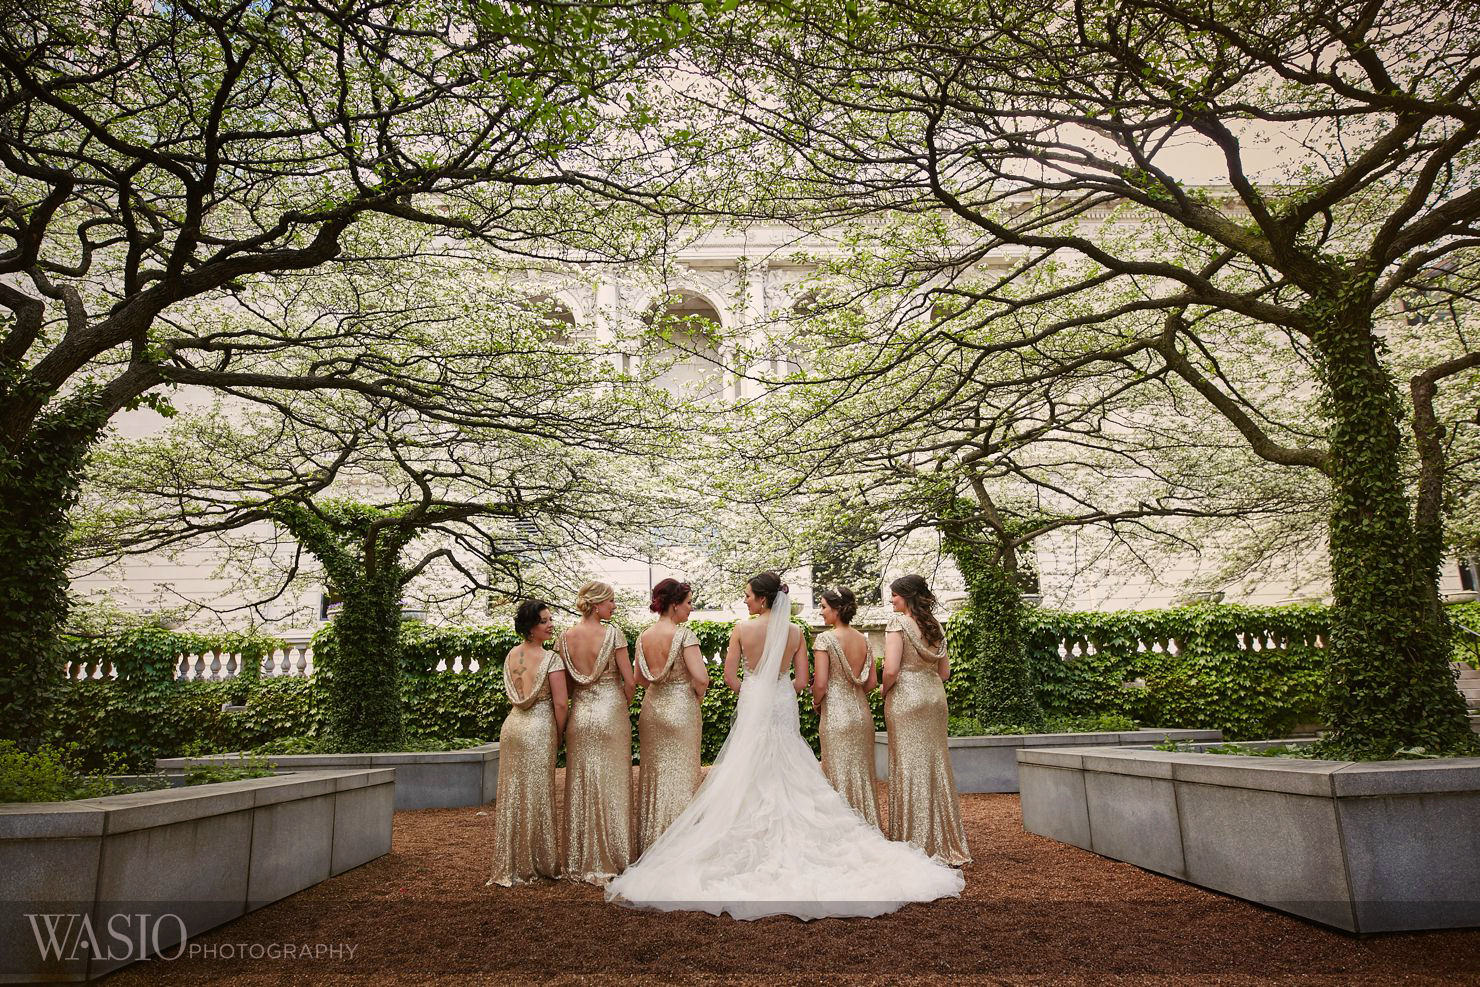 021_Lincoln-Park-Wedding_Dimphy-Mark__O3A9788 Lincoln Park Wedding - Dimphy & Mark